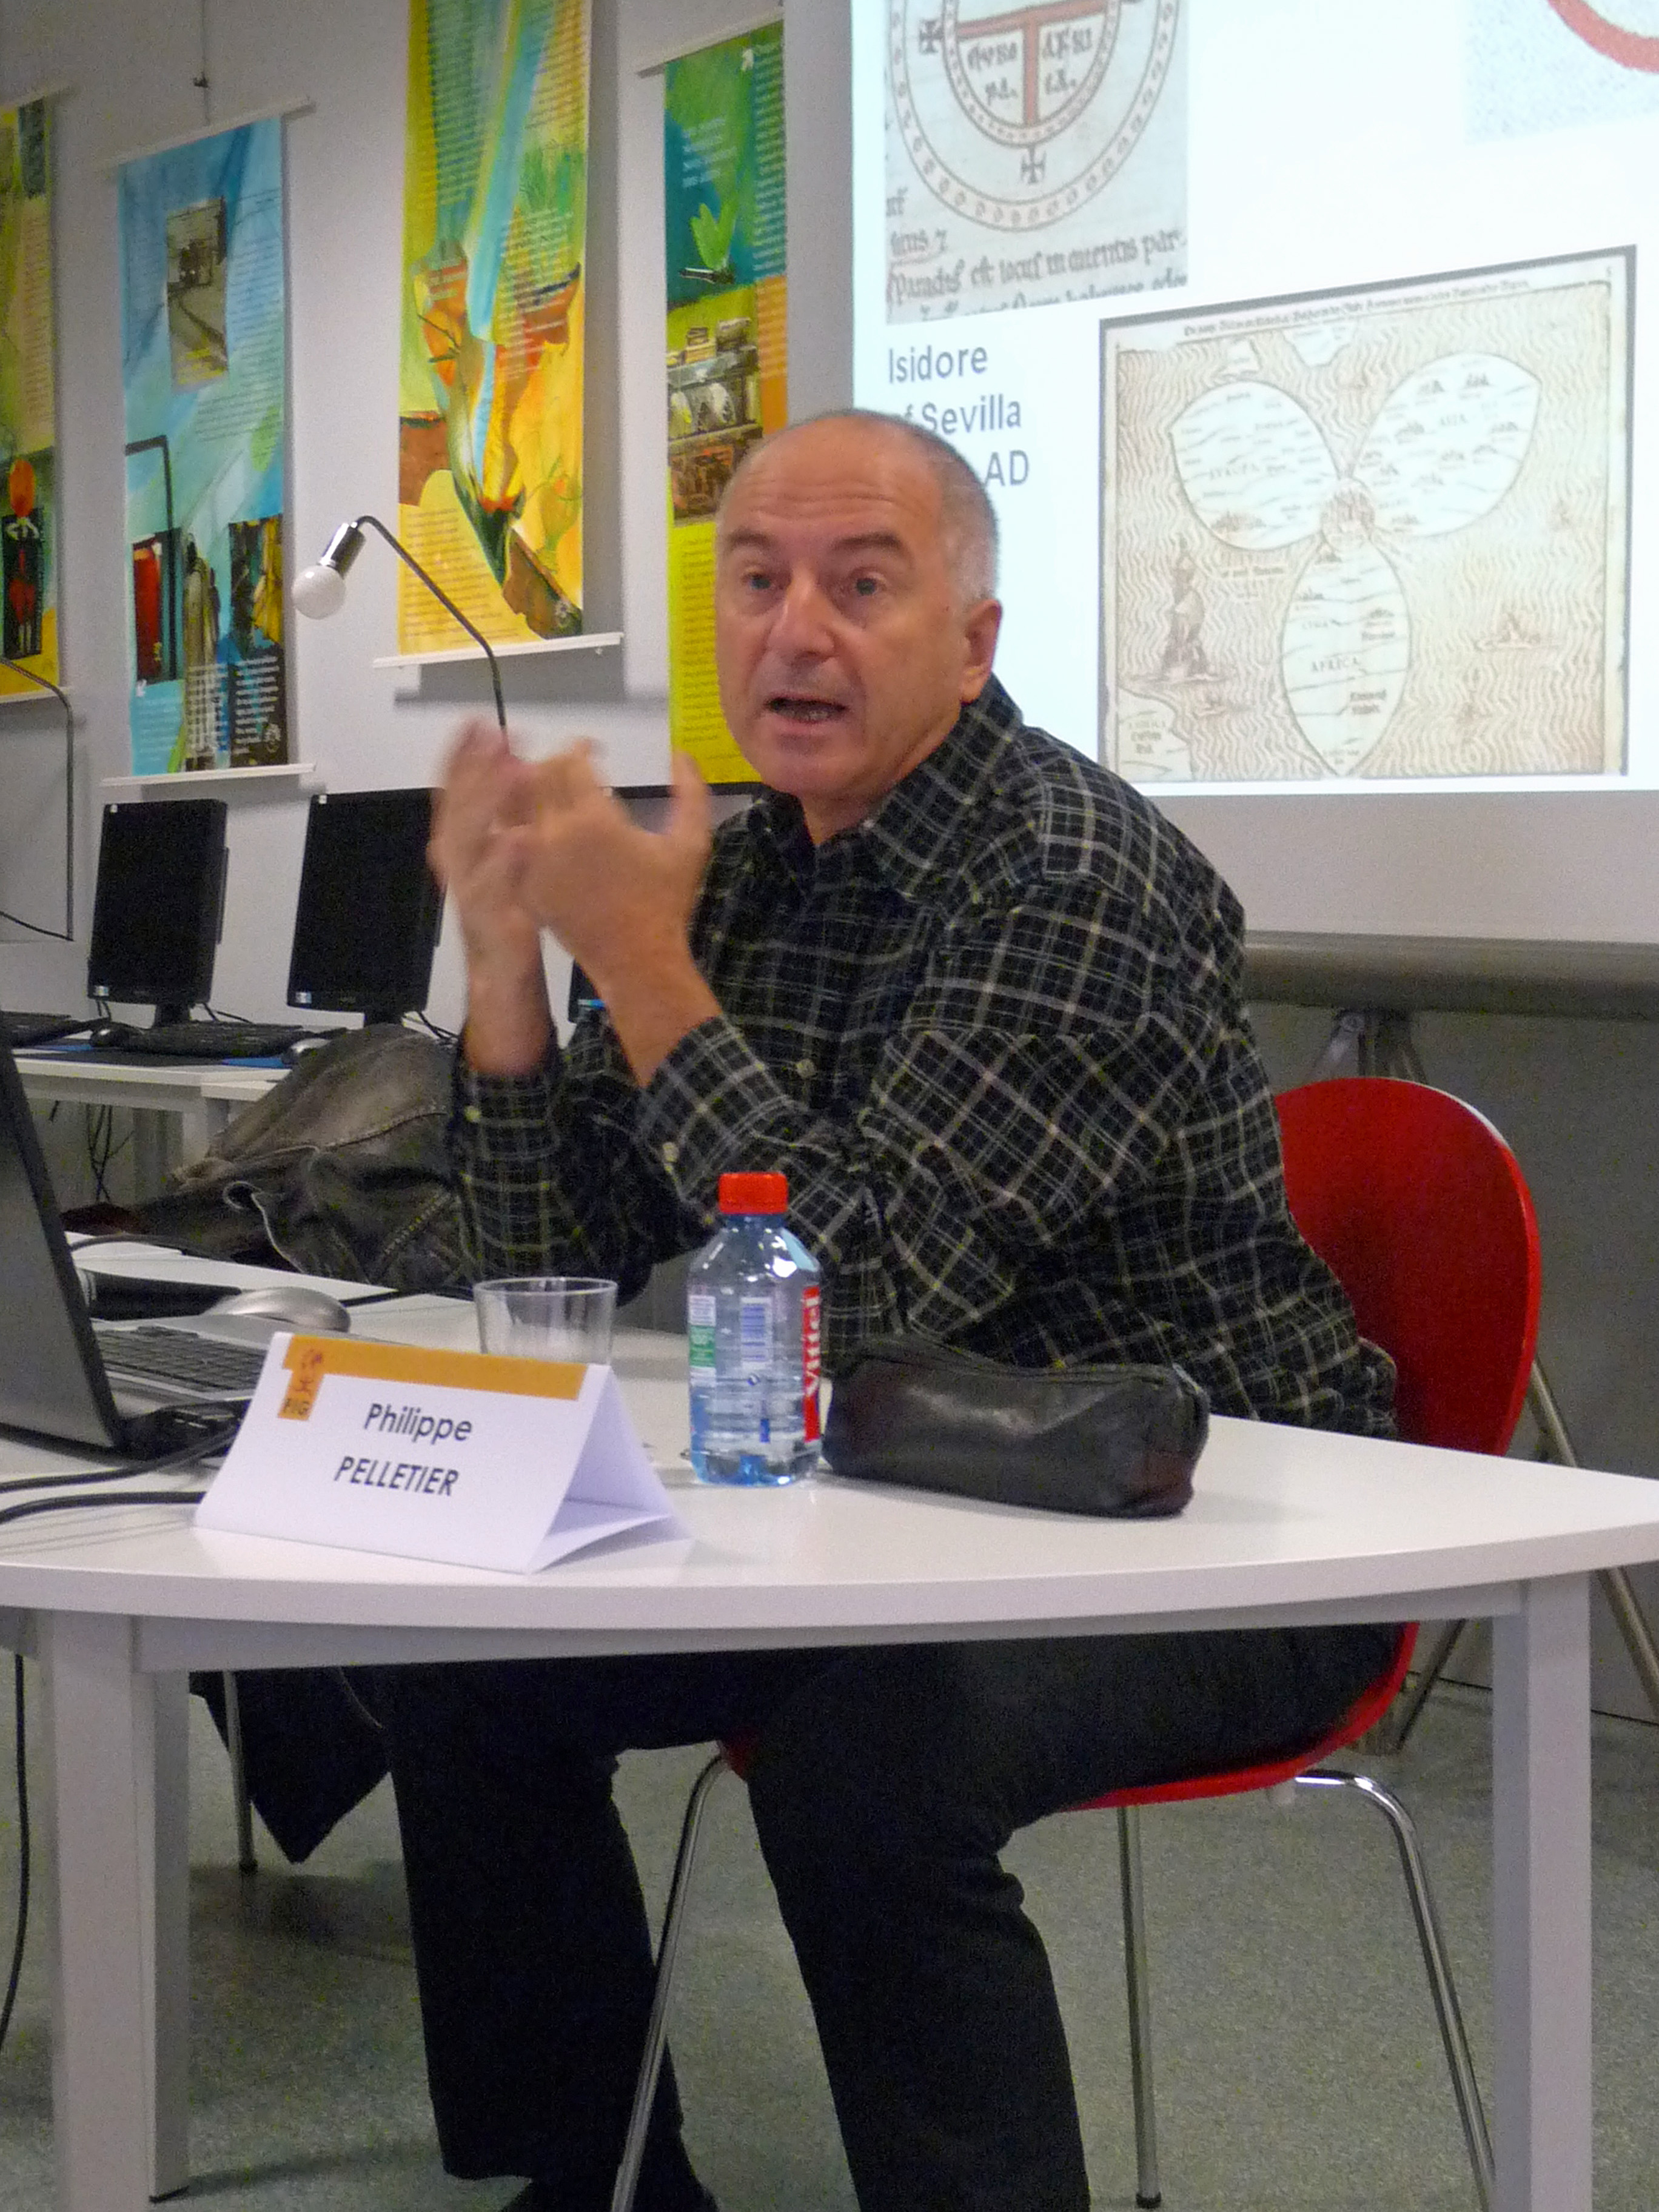 http://upload.wikimedia.org/wikipedia/commons/3/3e/Philippe_Pelletier-Festival_international_de_géographie_2011_(2).jpg